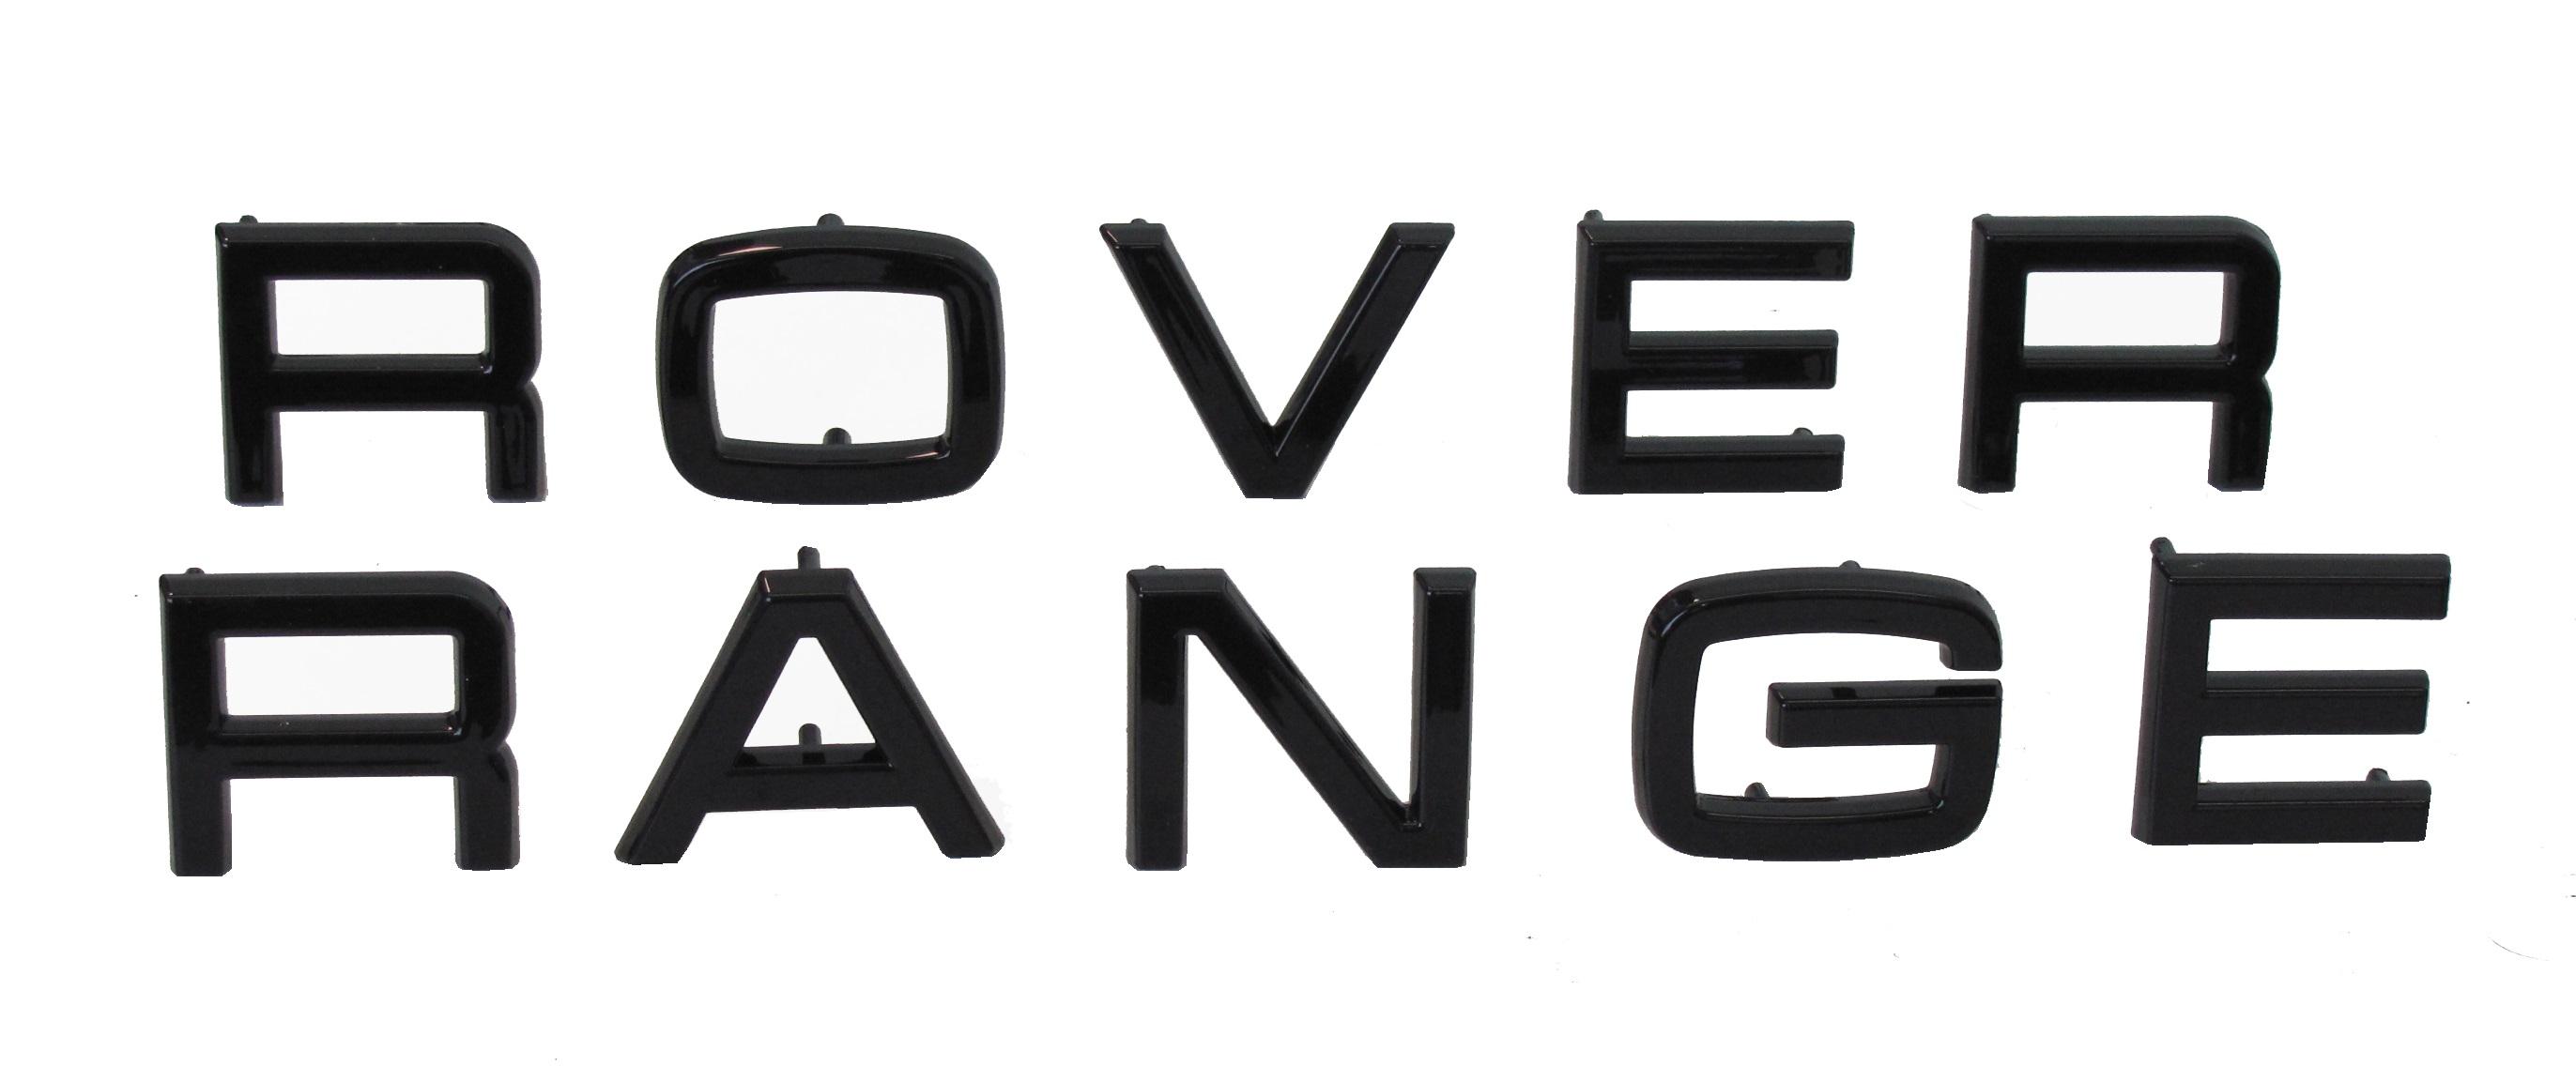 black lettering original pin type range rover classic bonnet font decal badge ebay. Black Bedroom Furniture Sets. Home Design Ideas